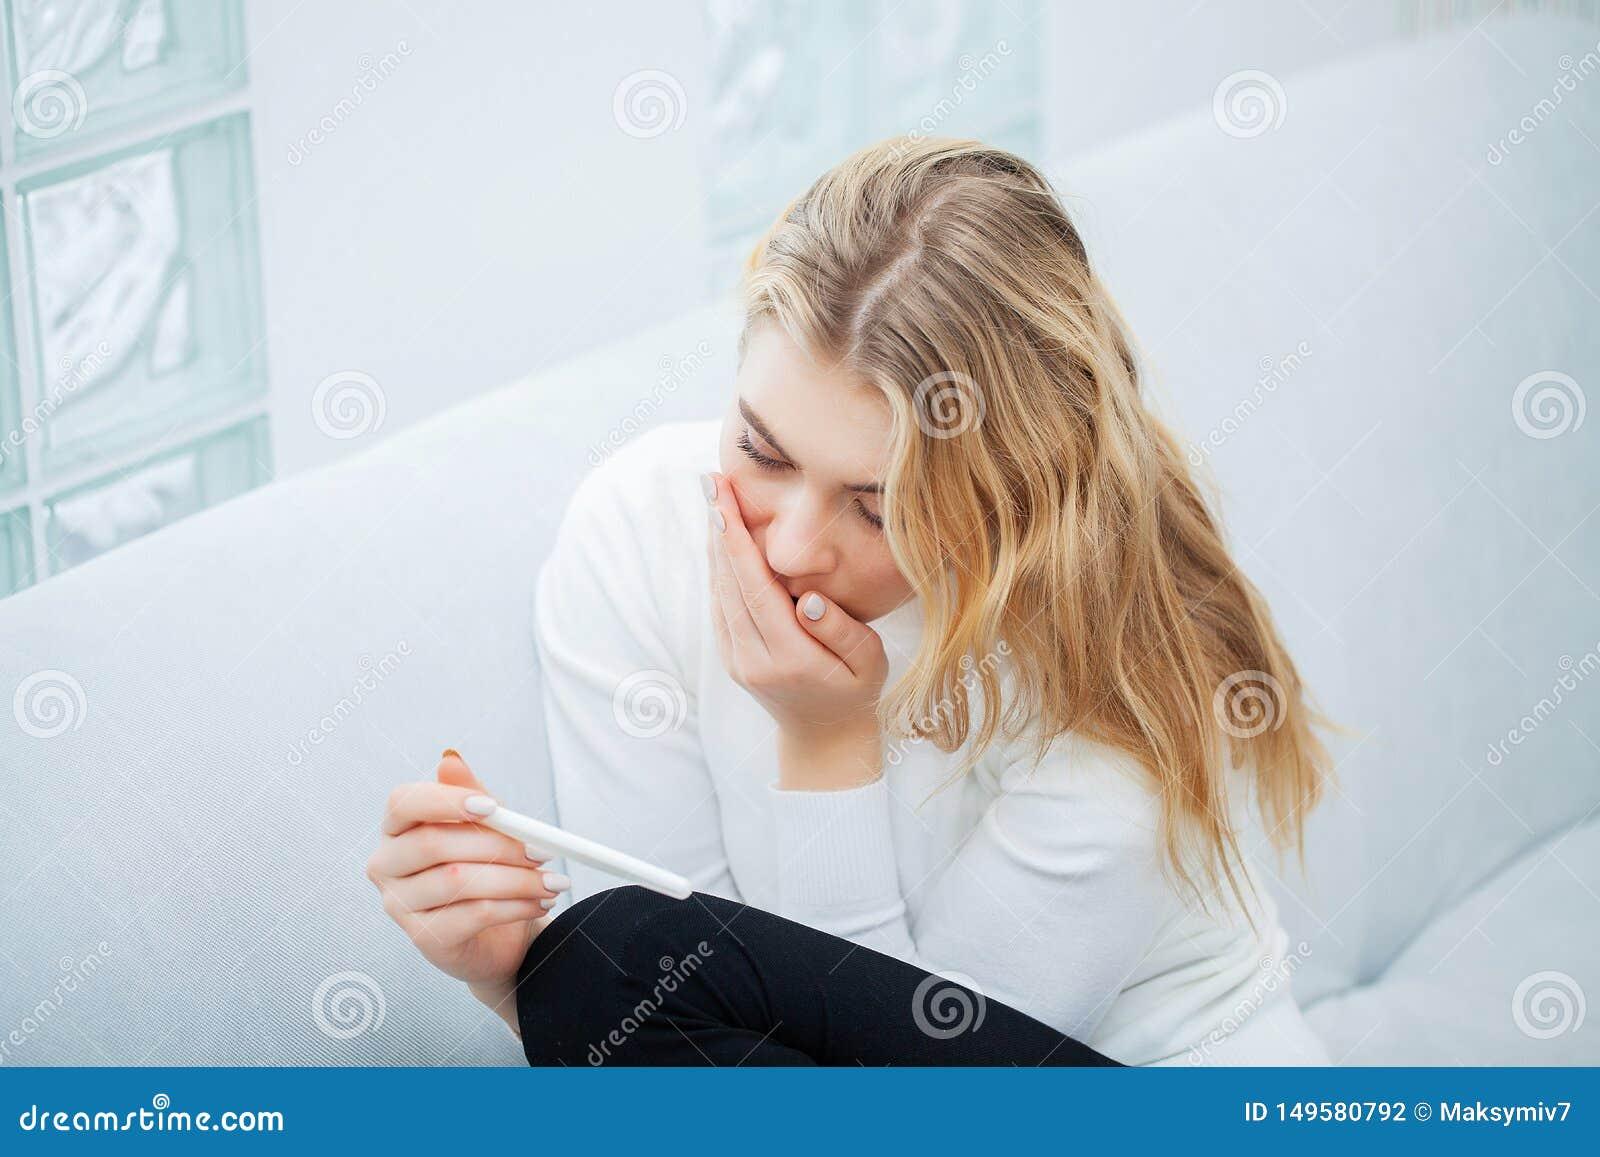 Positive Pregnancy Test. Portrait Of Desperate Young Woman ...